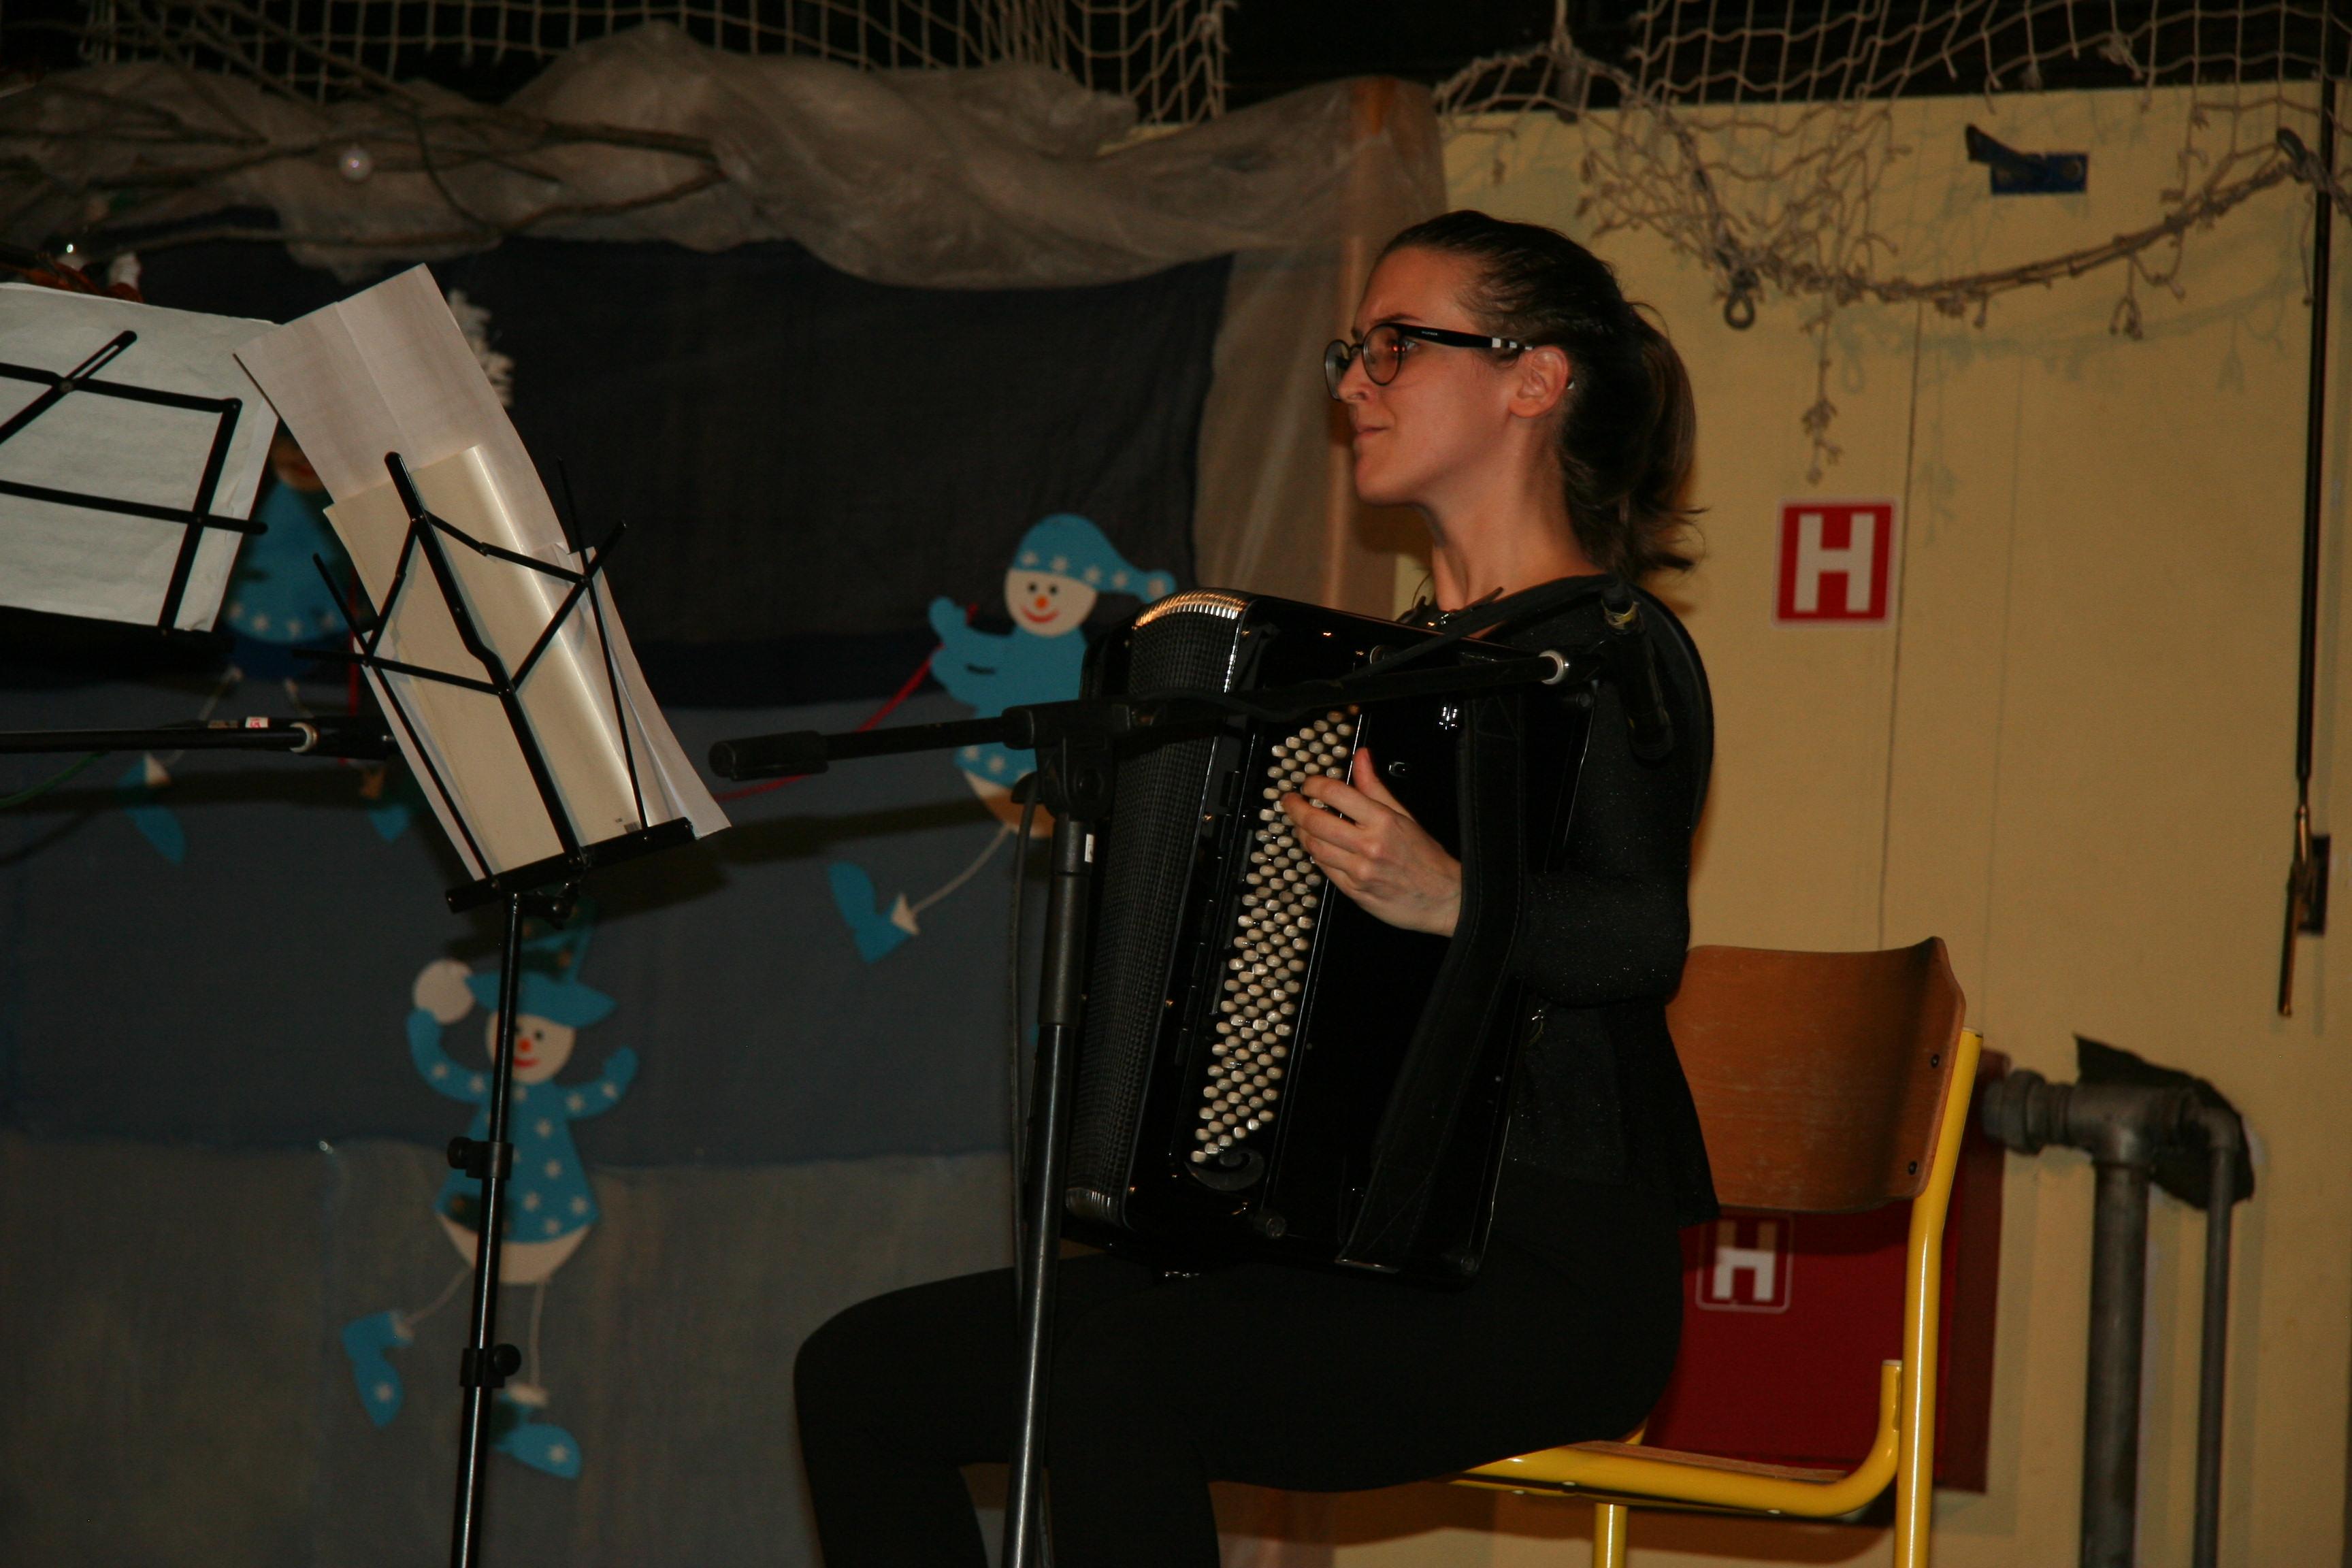 novoletno_humanitarni-koncert-2019-190